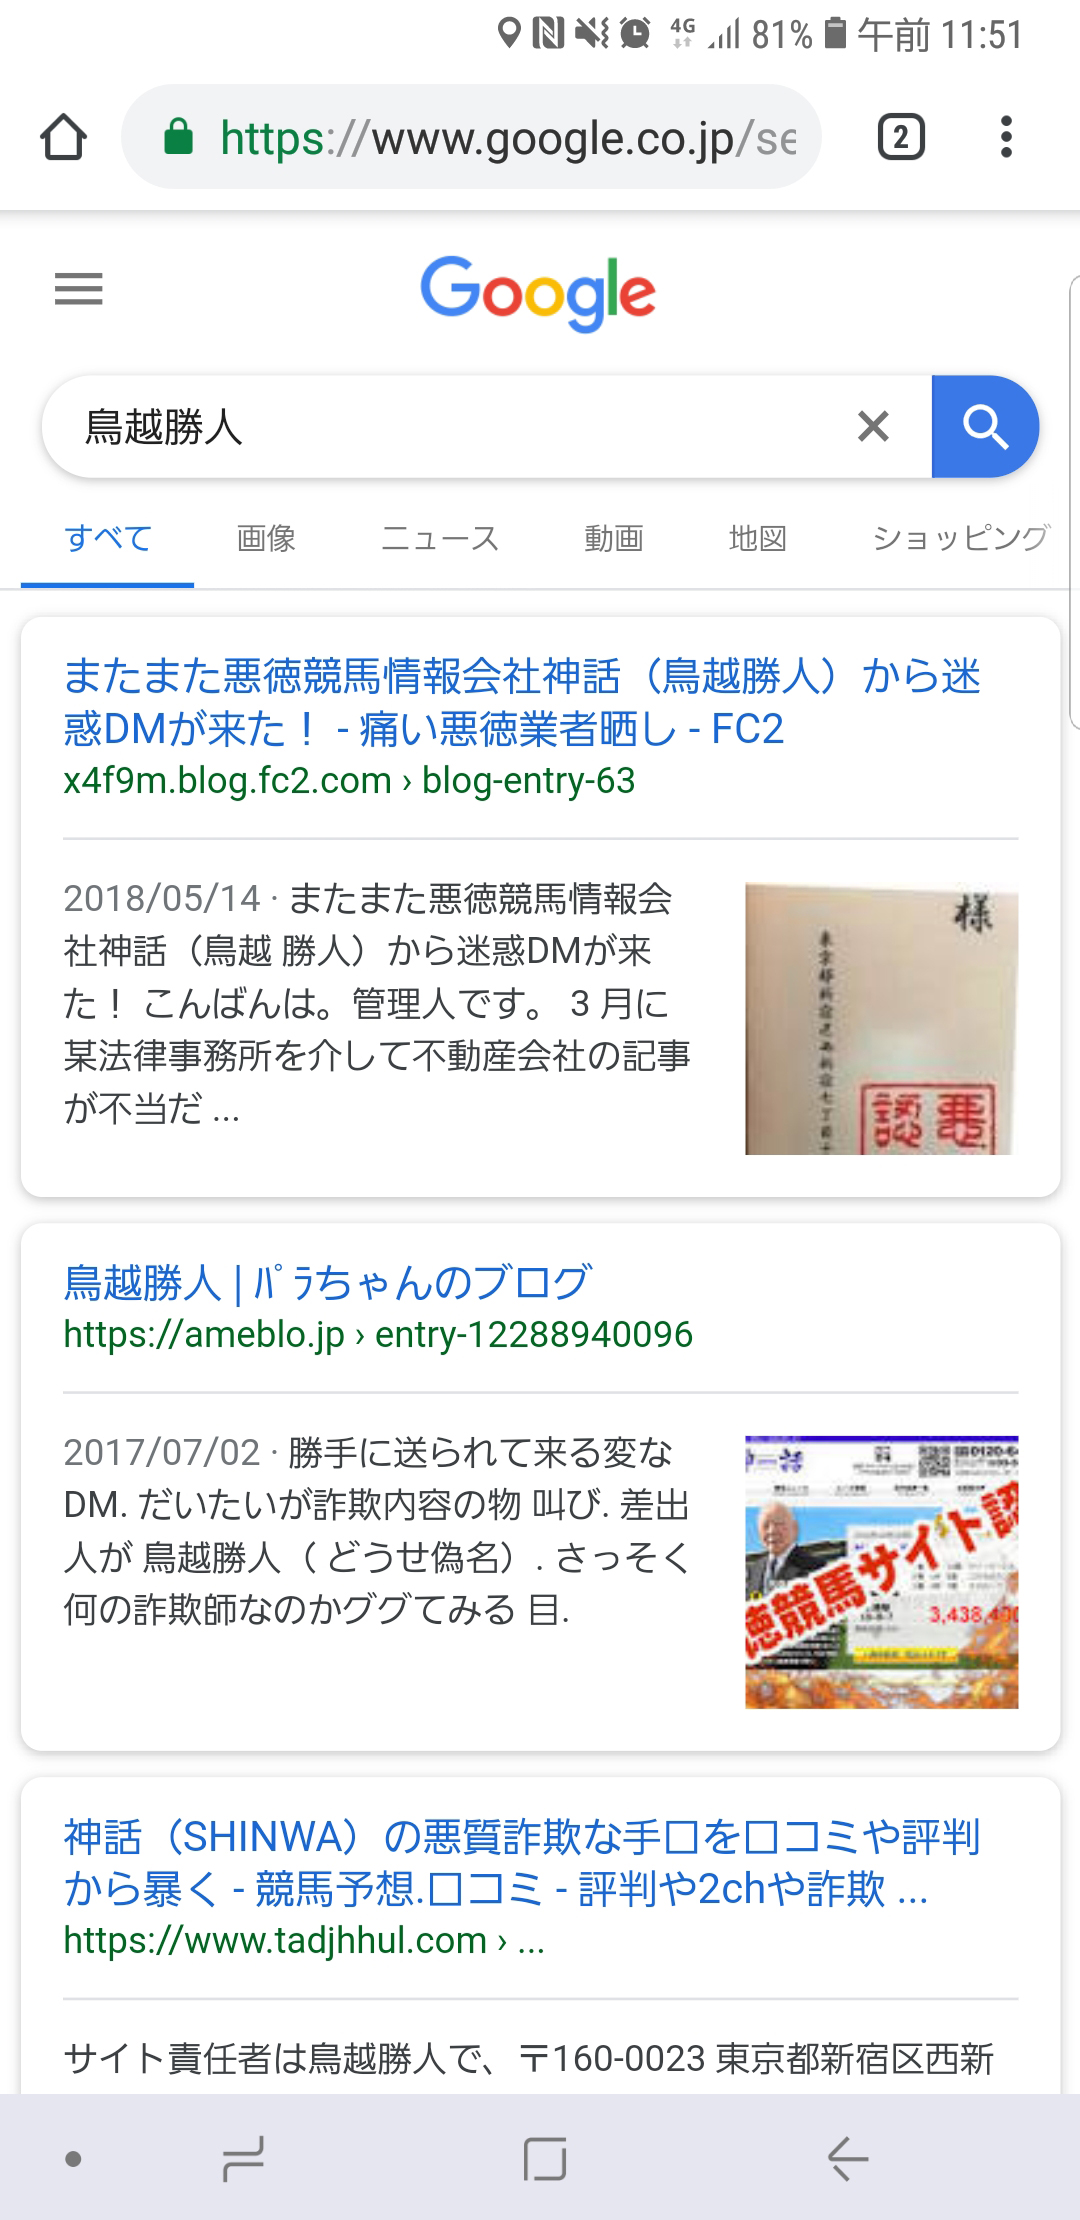 株式会社神話(SHINWA)非会員ページ 検証